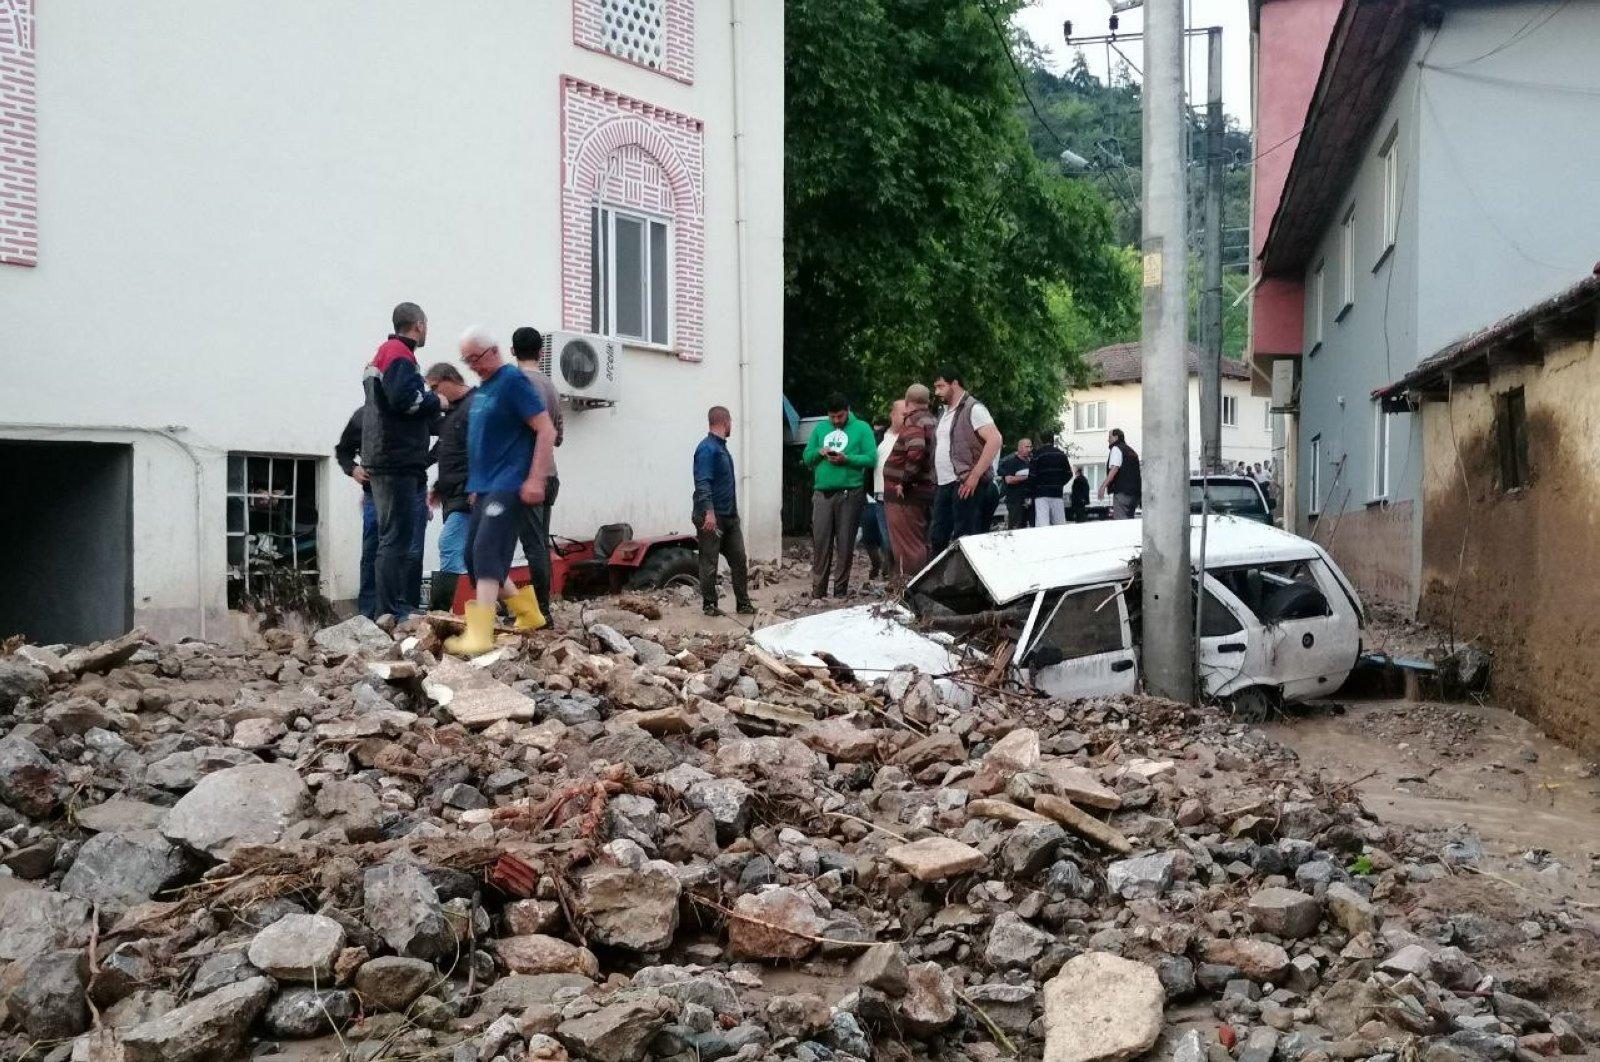 People look at debris left by floods in Dudaklı village, in Bursa, Turkey, June 22, 2020. (IHA Photo)